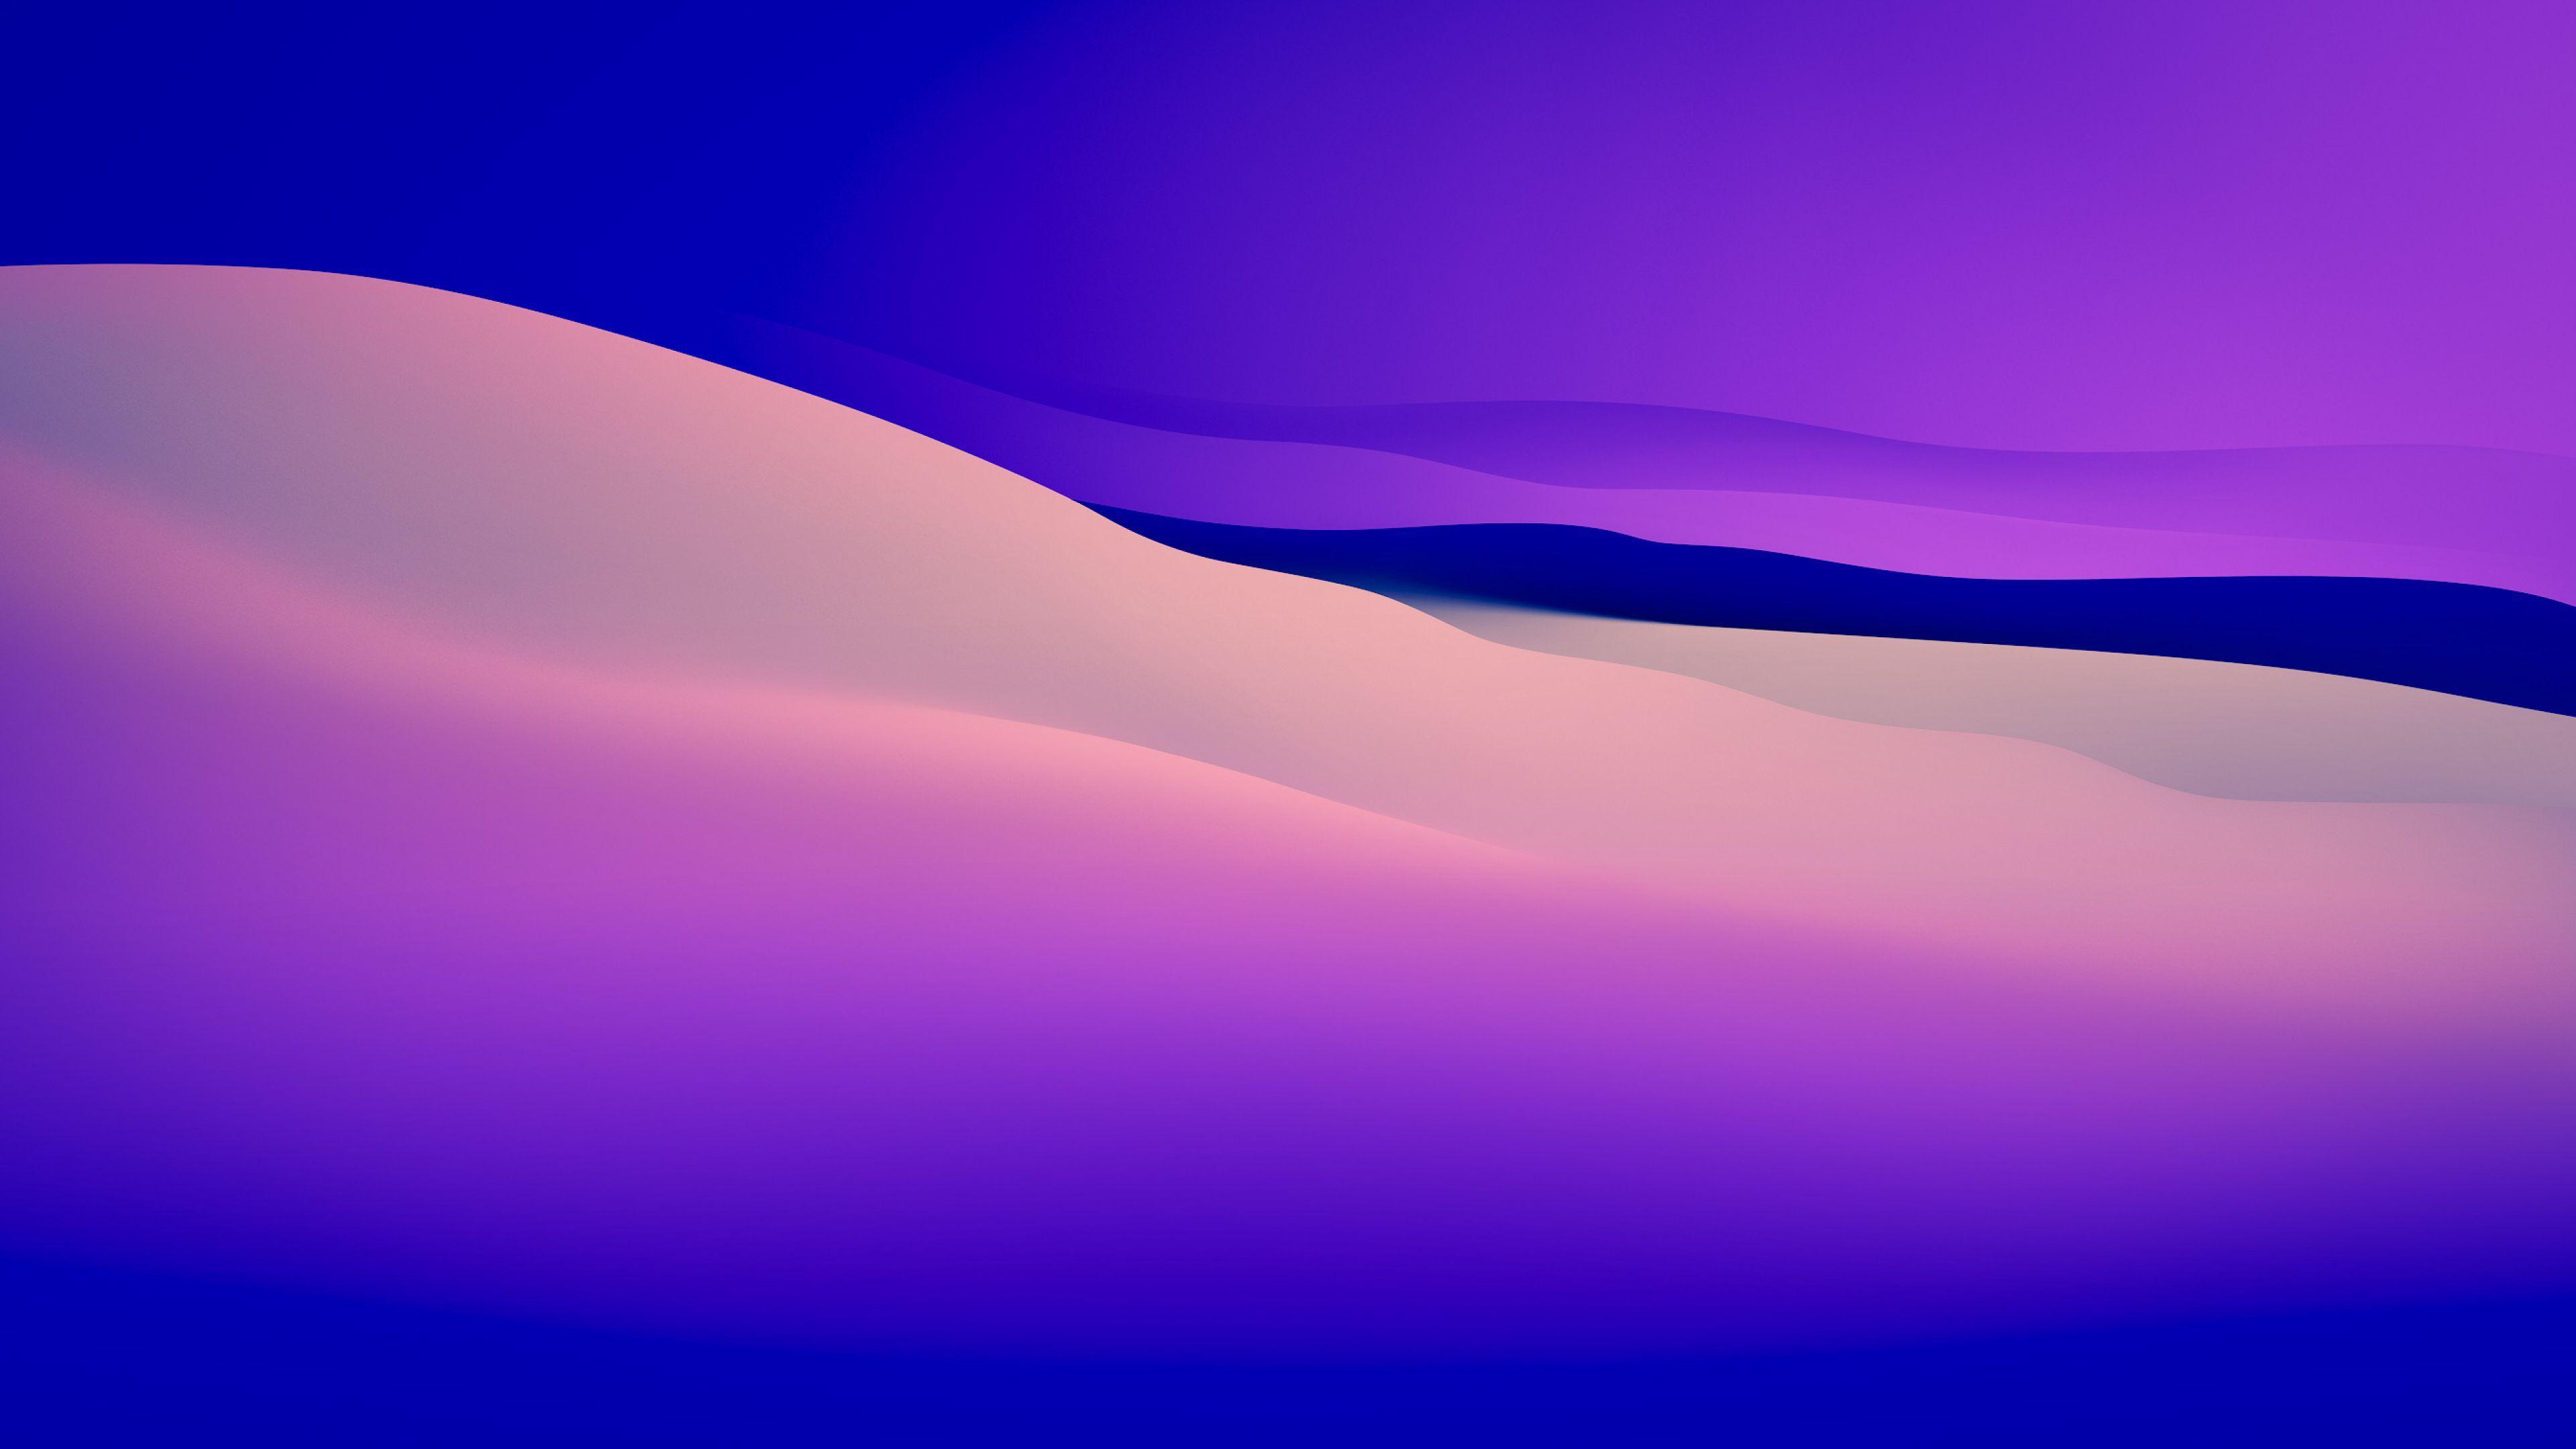 macOS Big Sur Wallpapers - Top Free ...